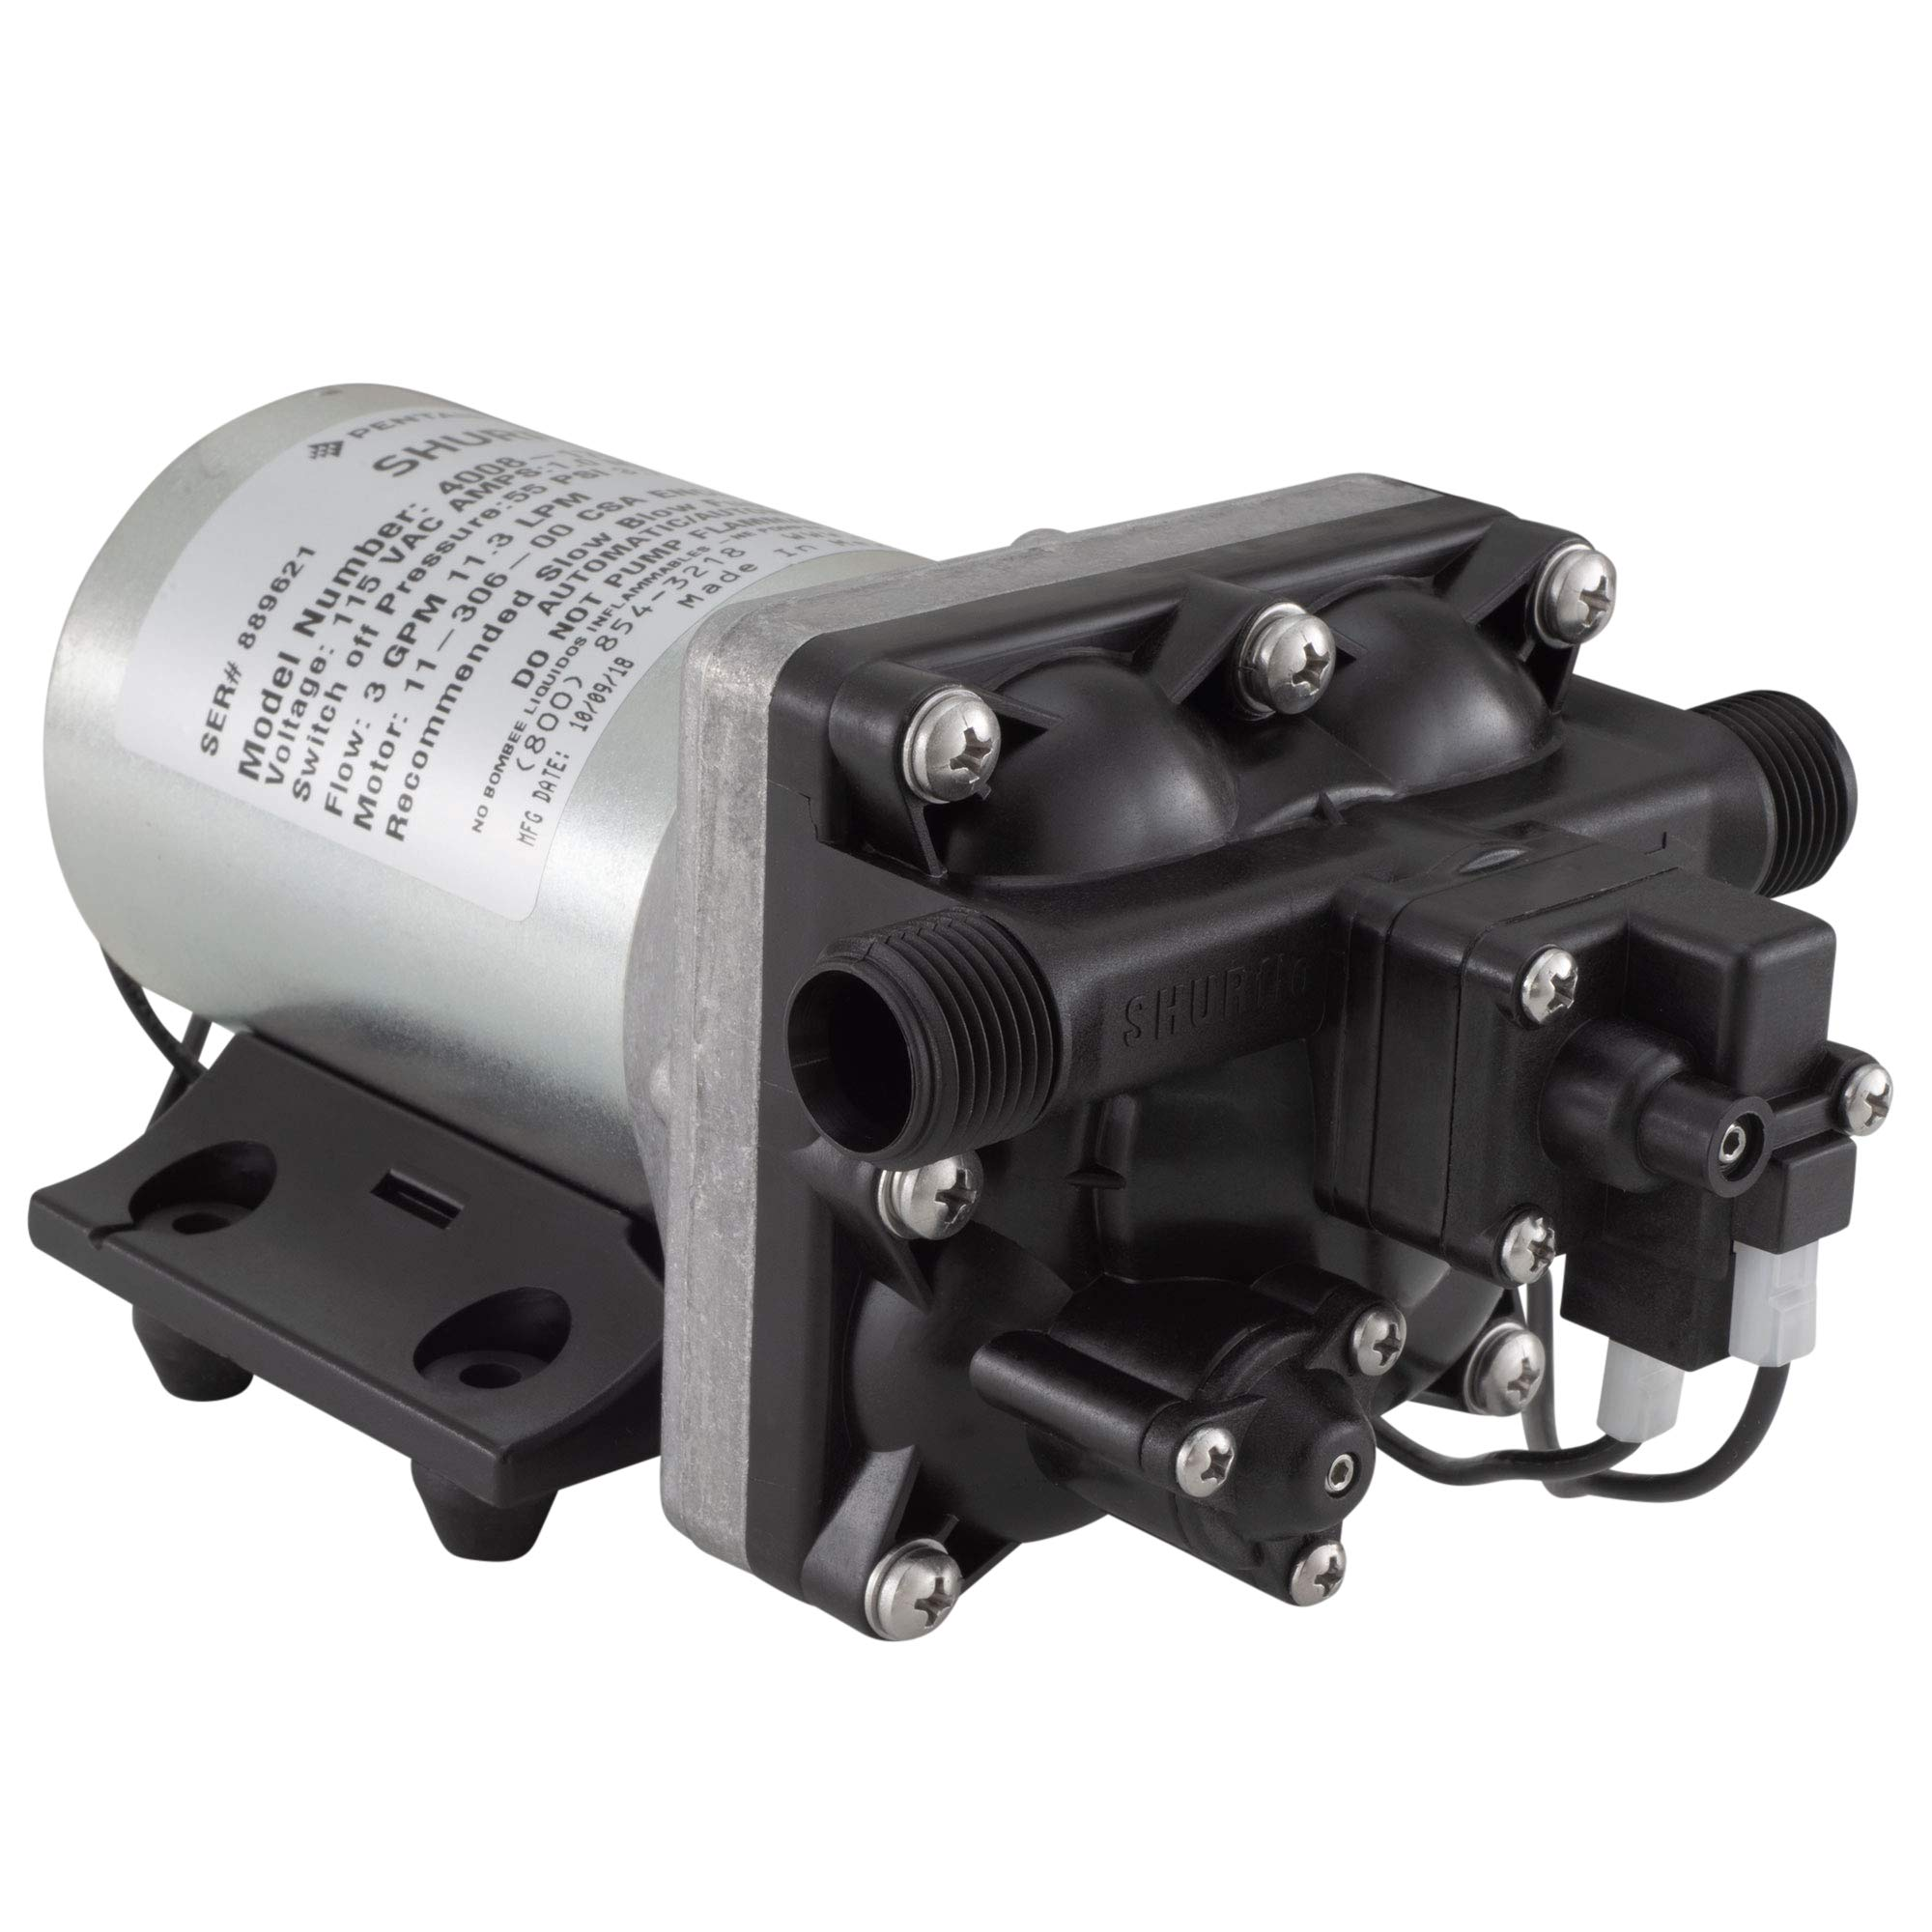 Brand New SHURflo RV Marine Boat 115V 3.0GPM Water Pump 4008-171-A65/E65 Revolution with STRAINER